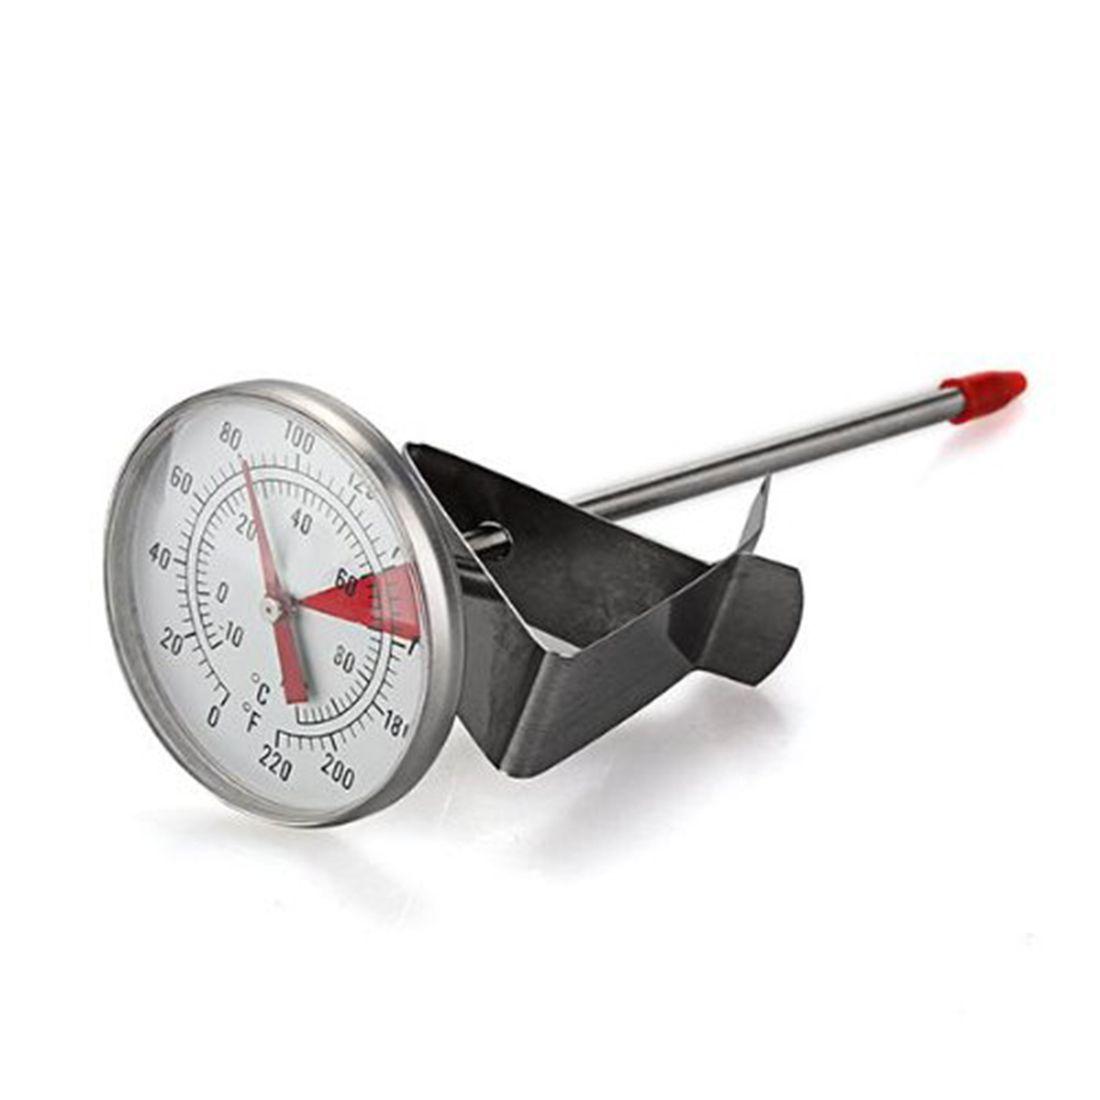 Termômetro Espeto -10ºC a 100ºC para Fixar na Panela